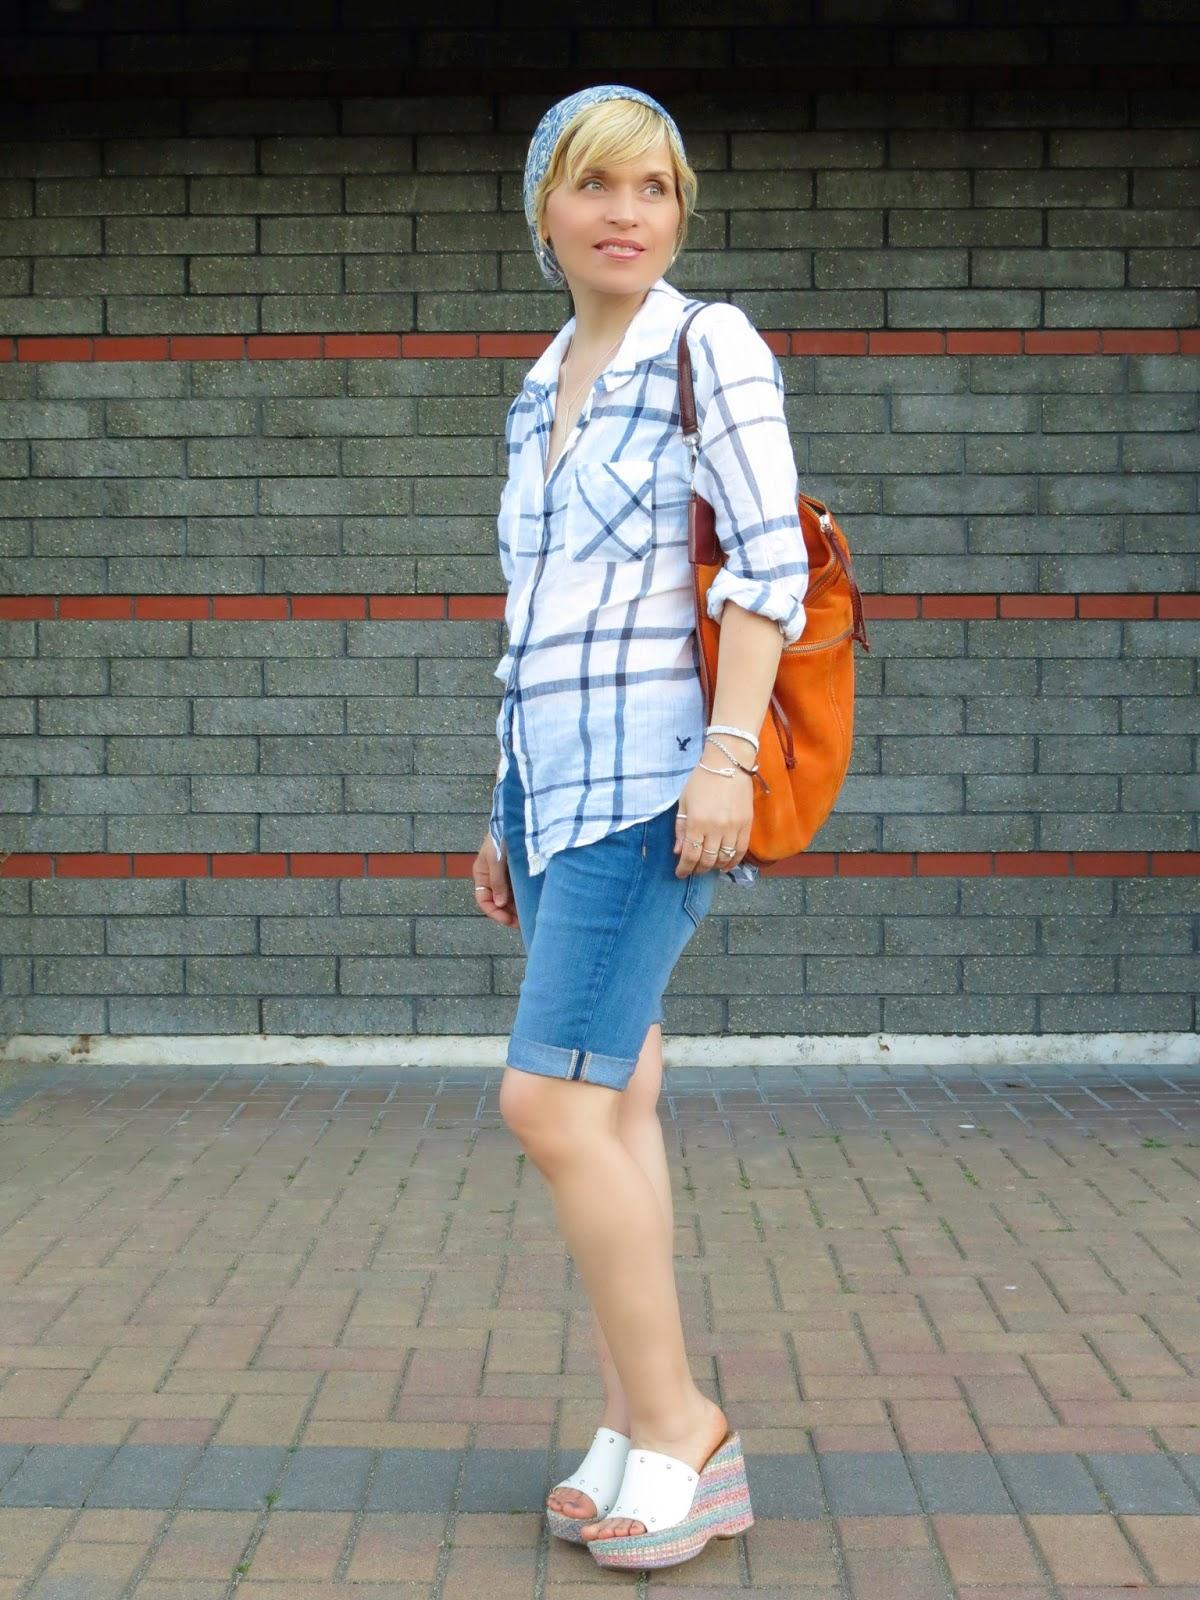 styling a white plaid shirt with denim bermudas, platform mules, and a summer beanie